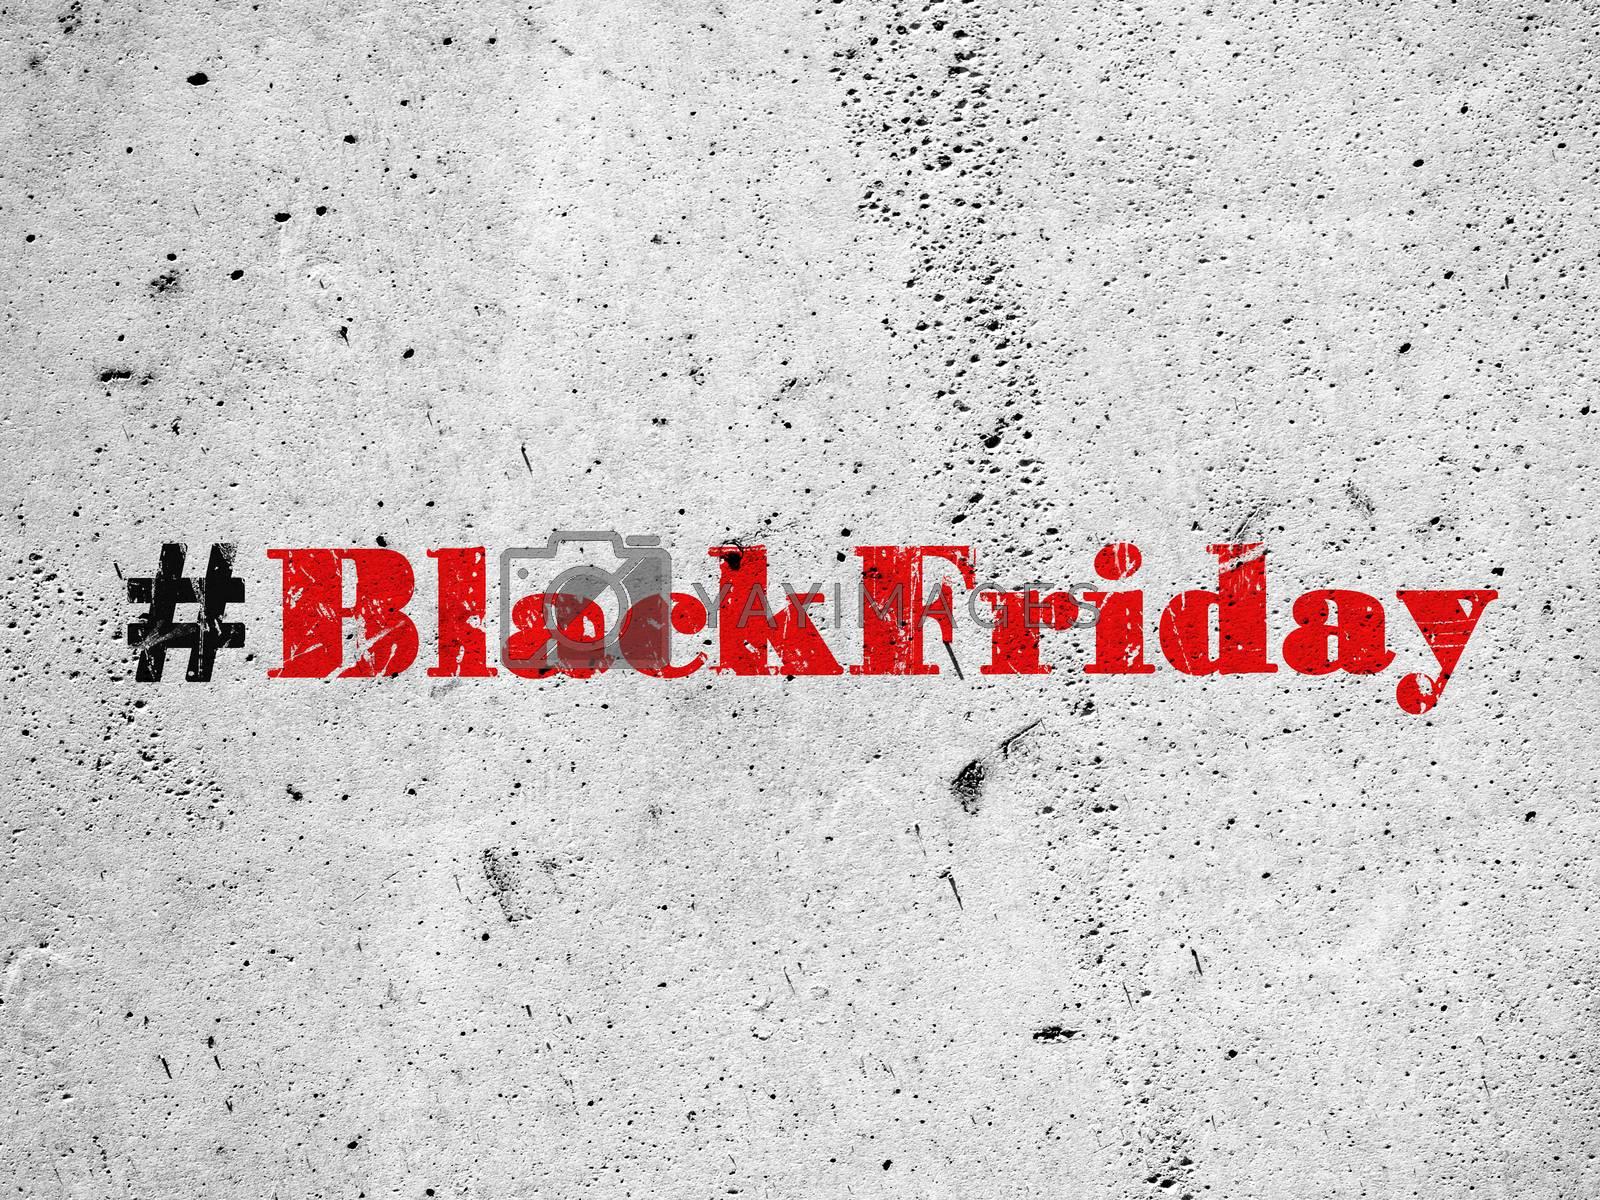 Black friday hashtag on concrete wall by Vaidas Bucys